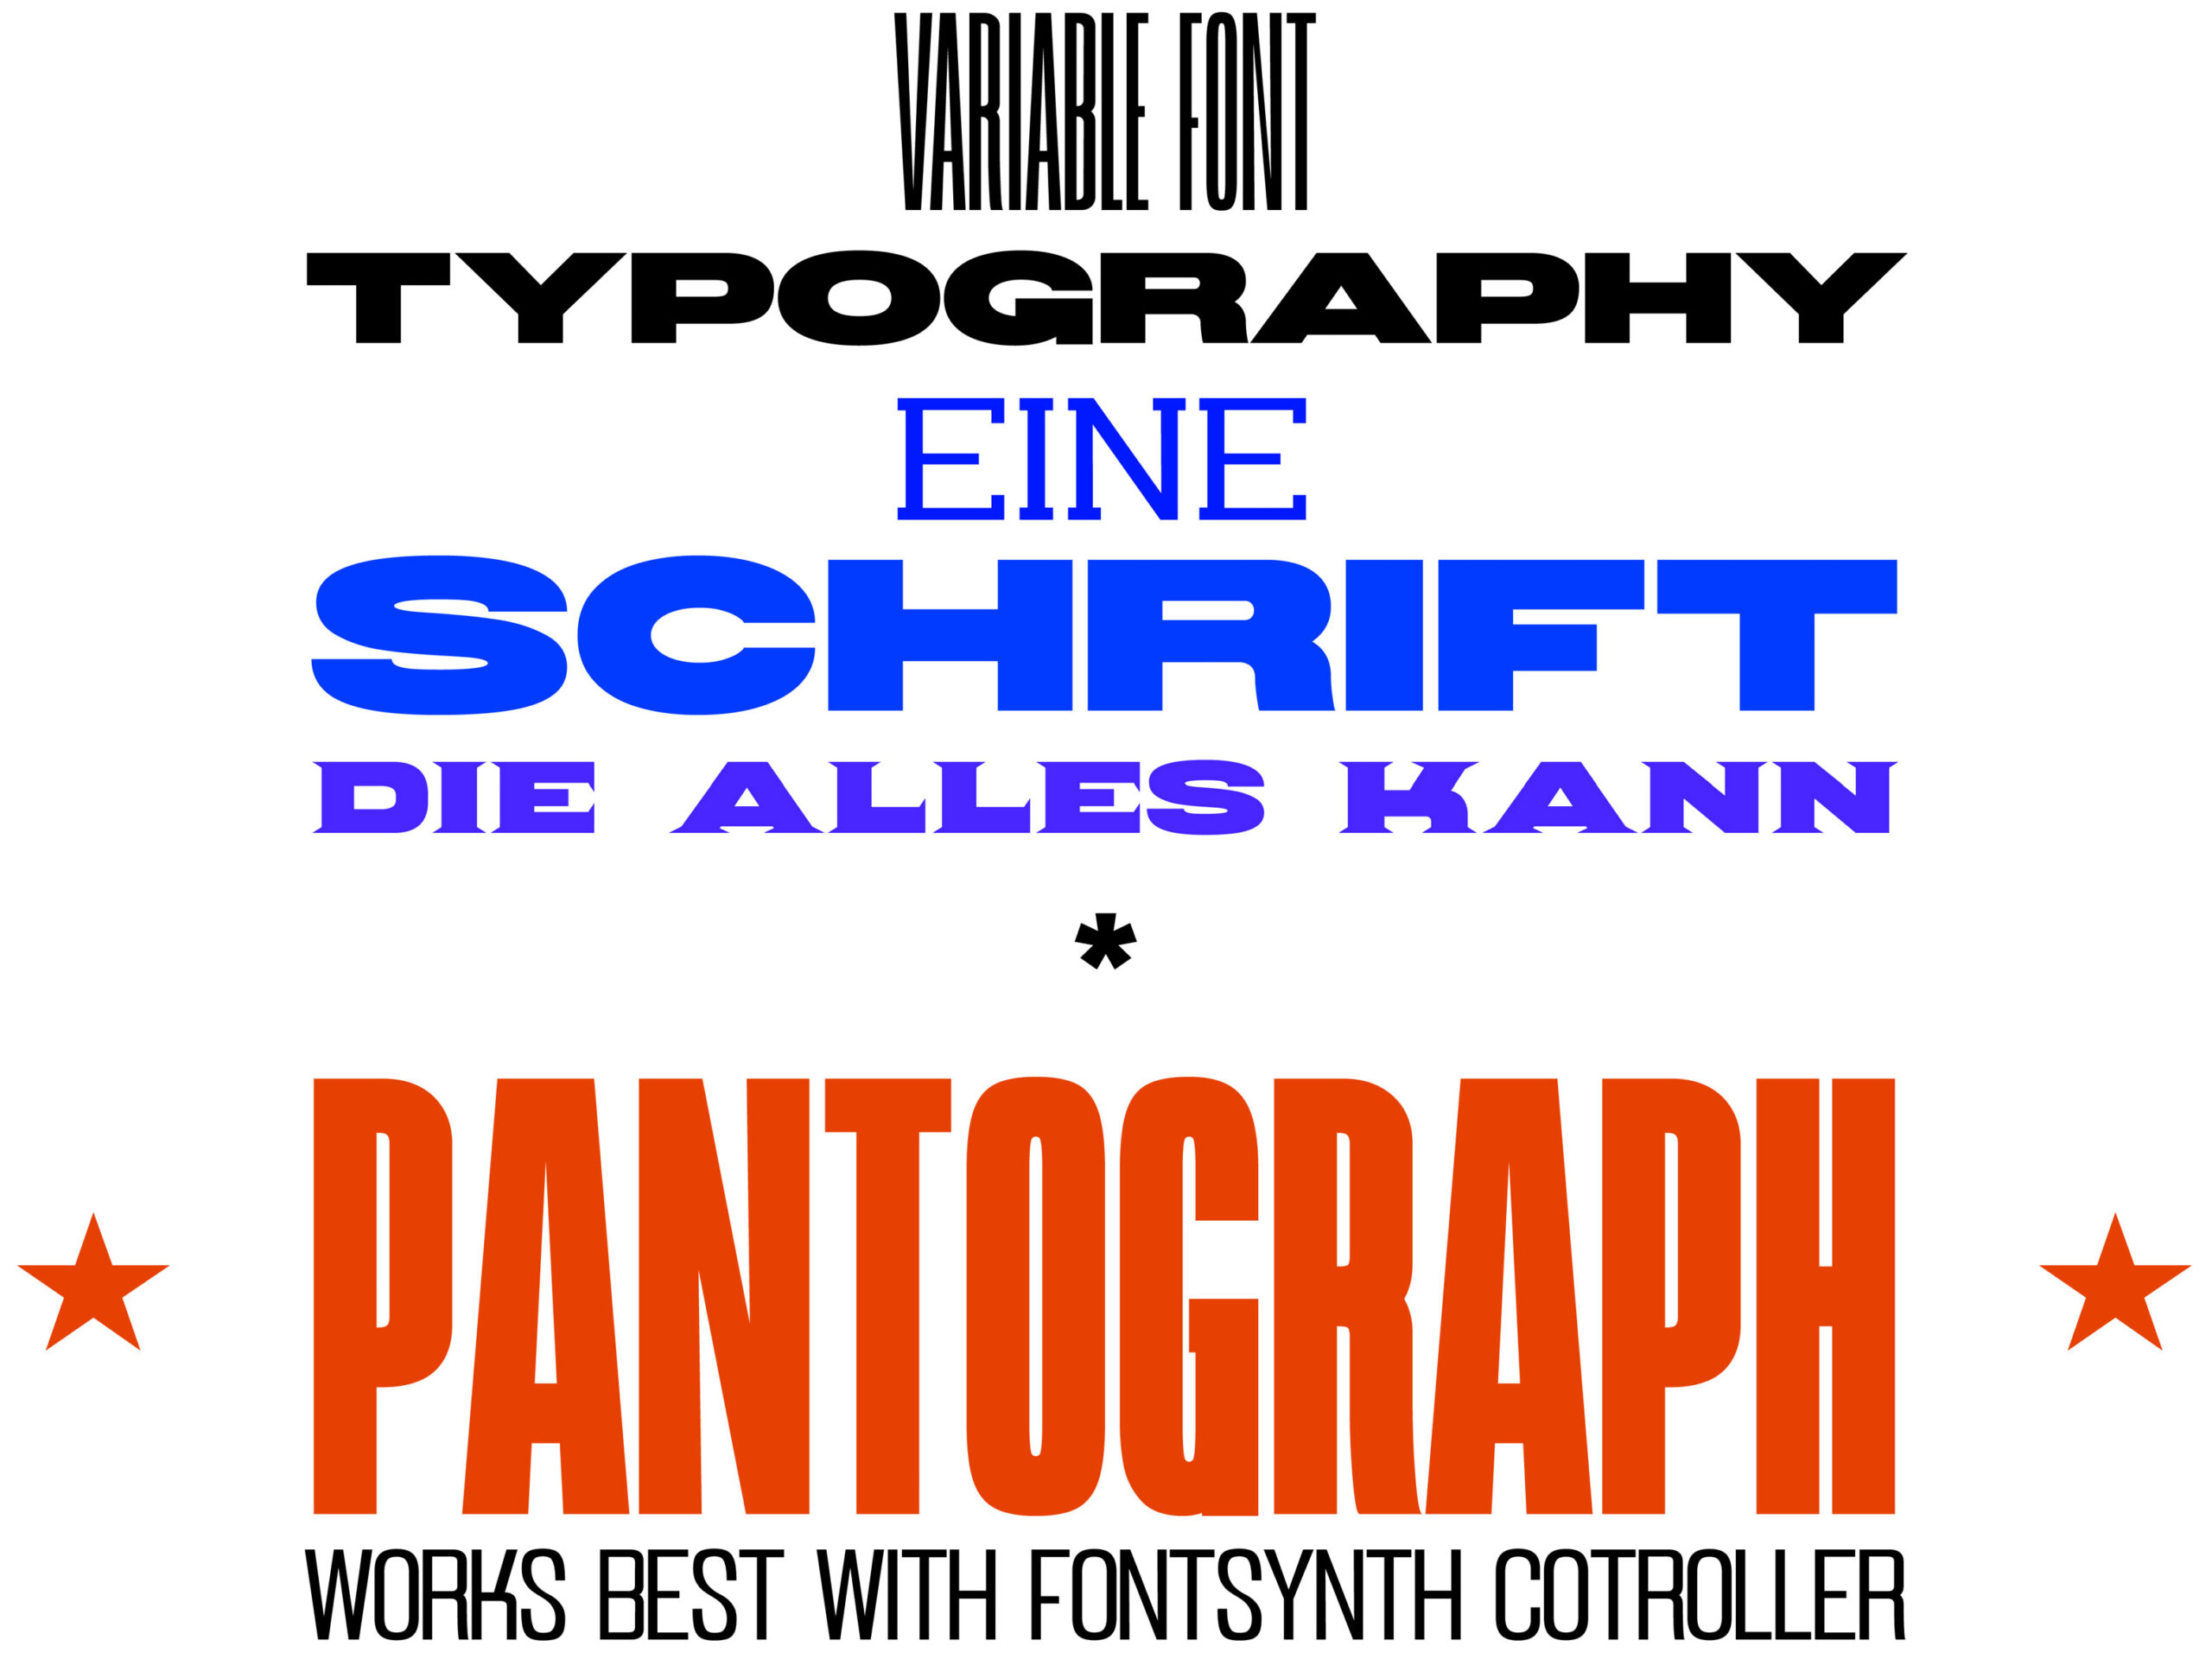 pantograph specimen, Diploma 2019, Sebastian Knöbber